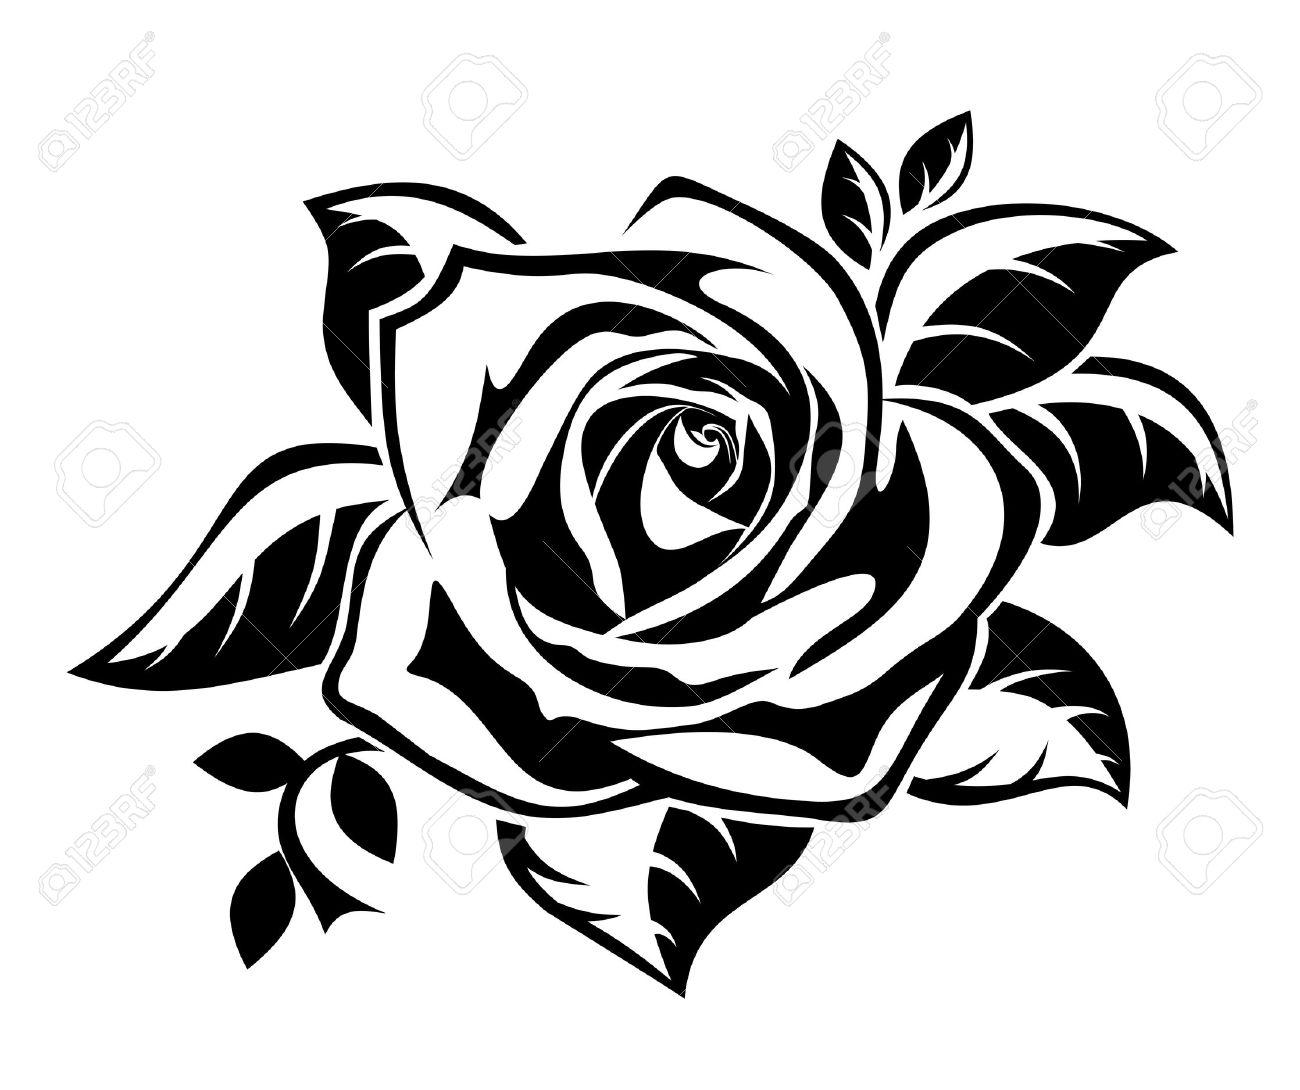 Rose Swirl Vector by joezerosum.